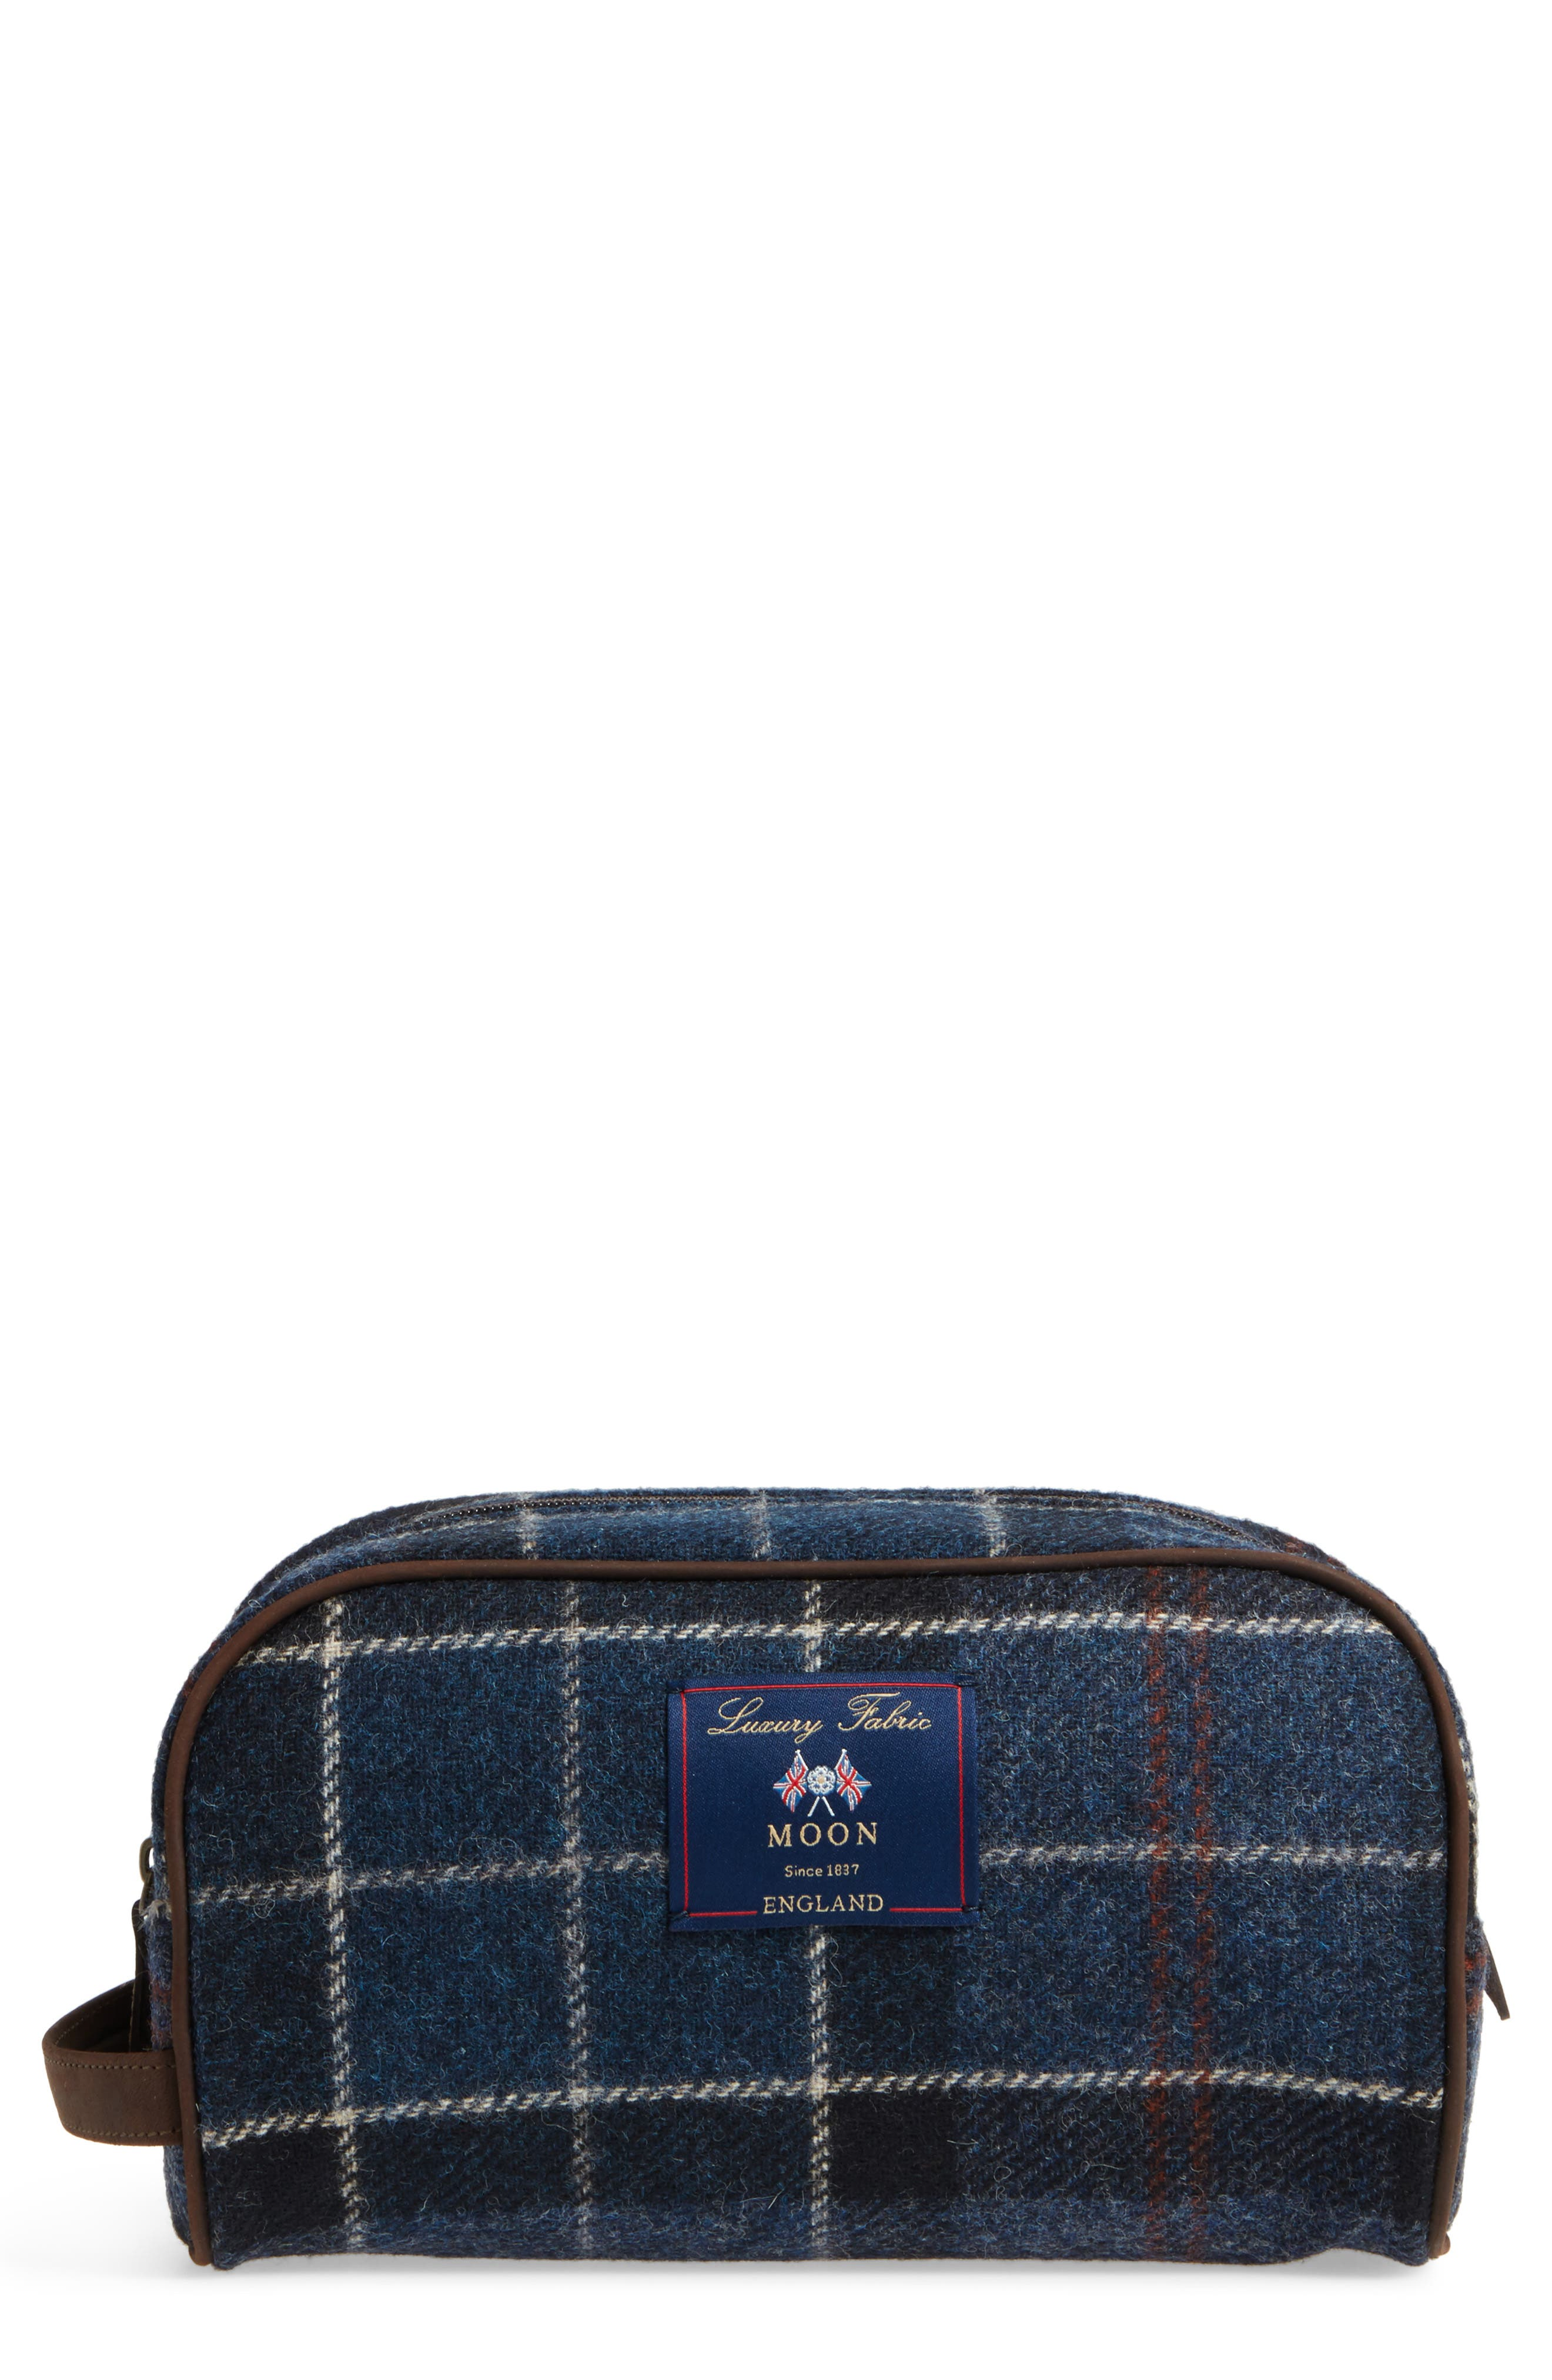 Tartan Dopp Kit,                         Main,                         color, 420